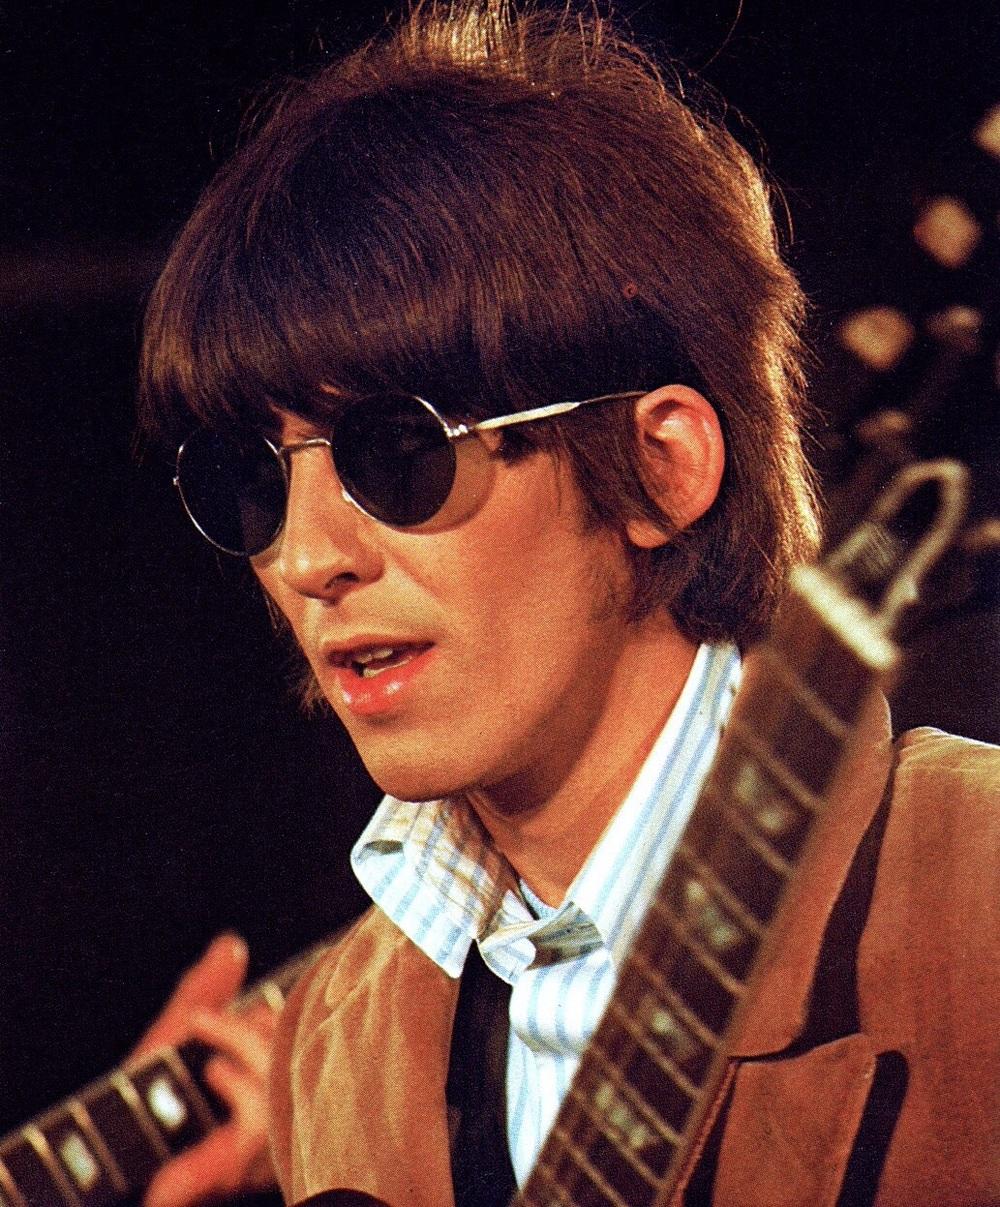 George Harrison circa 1966.